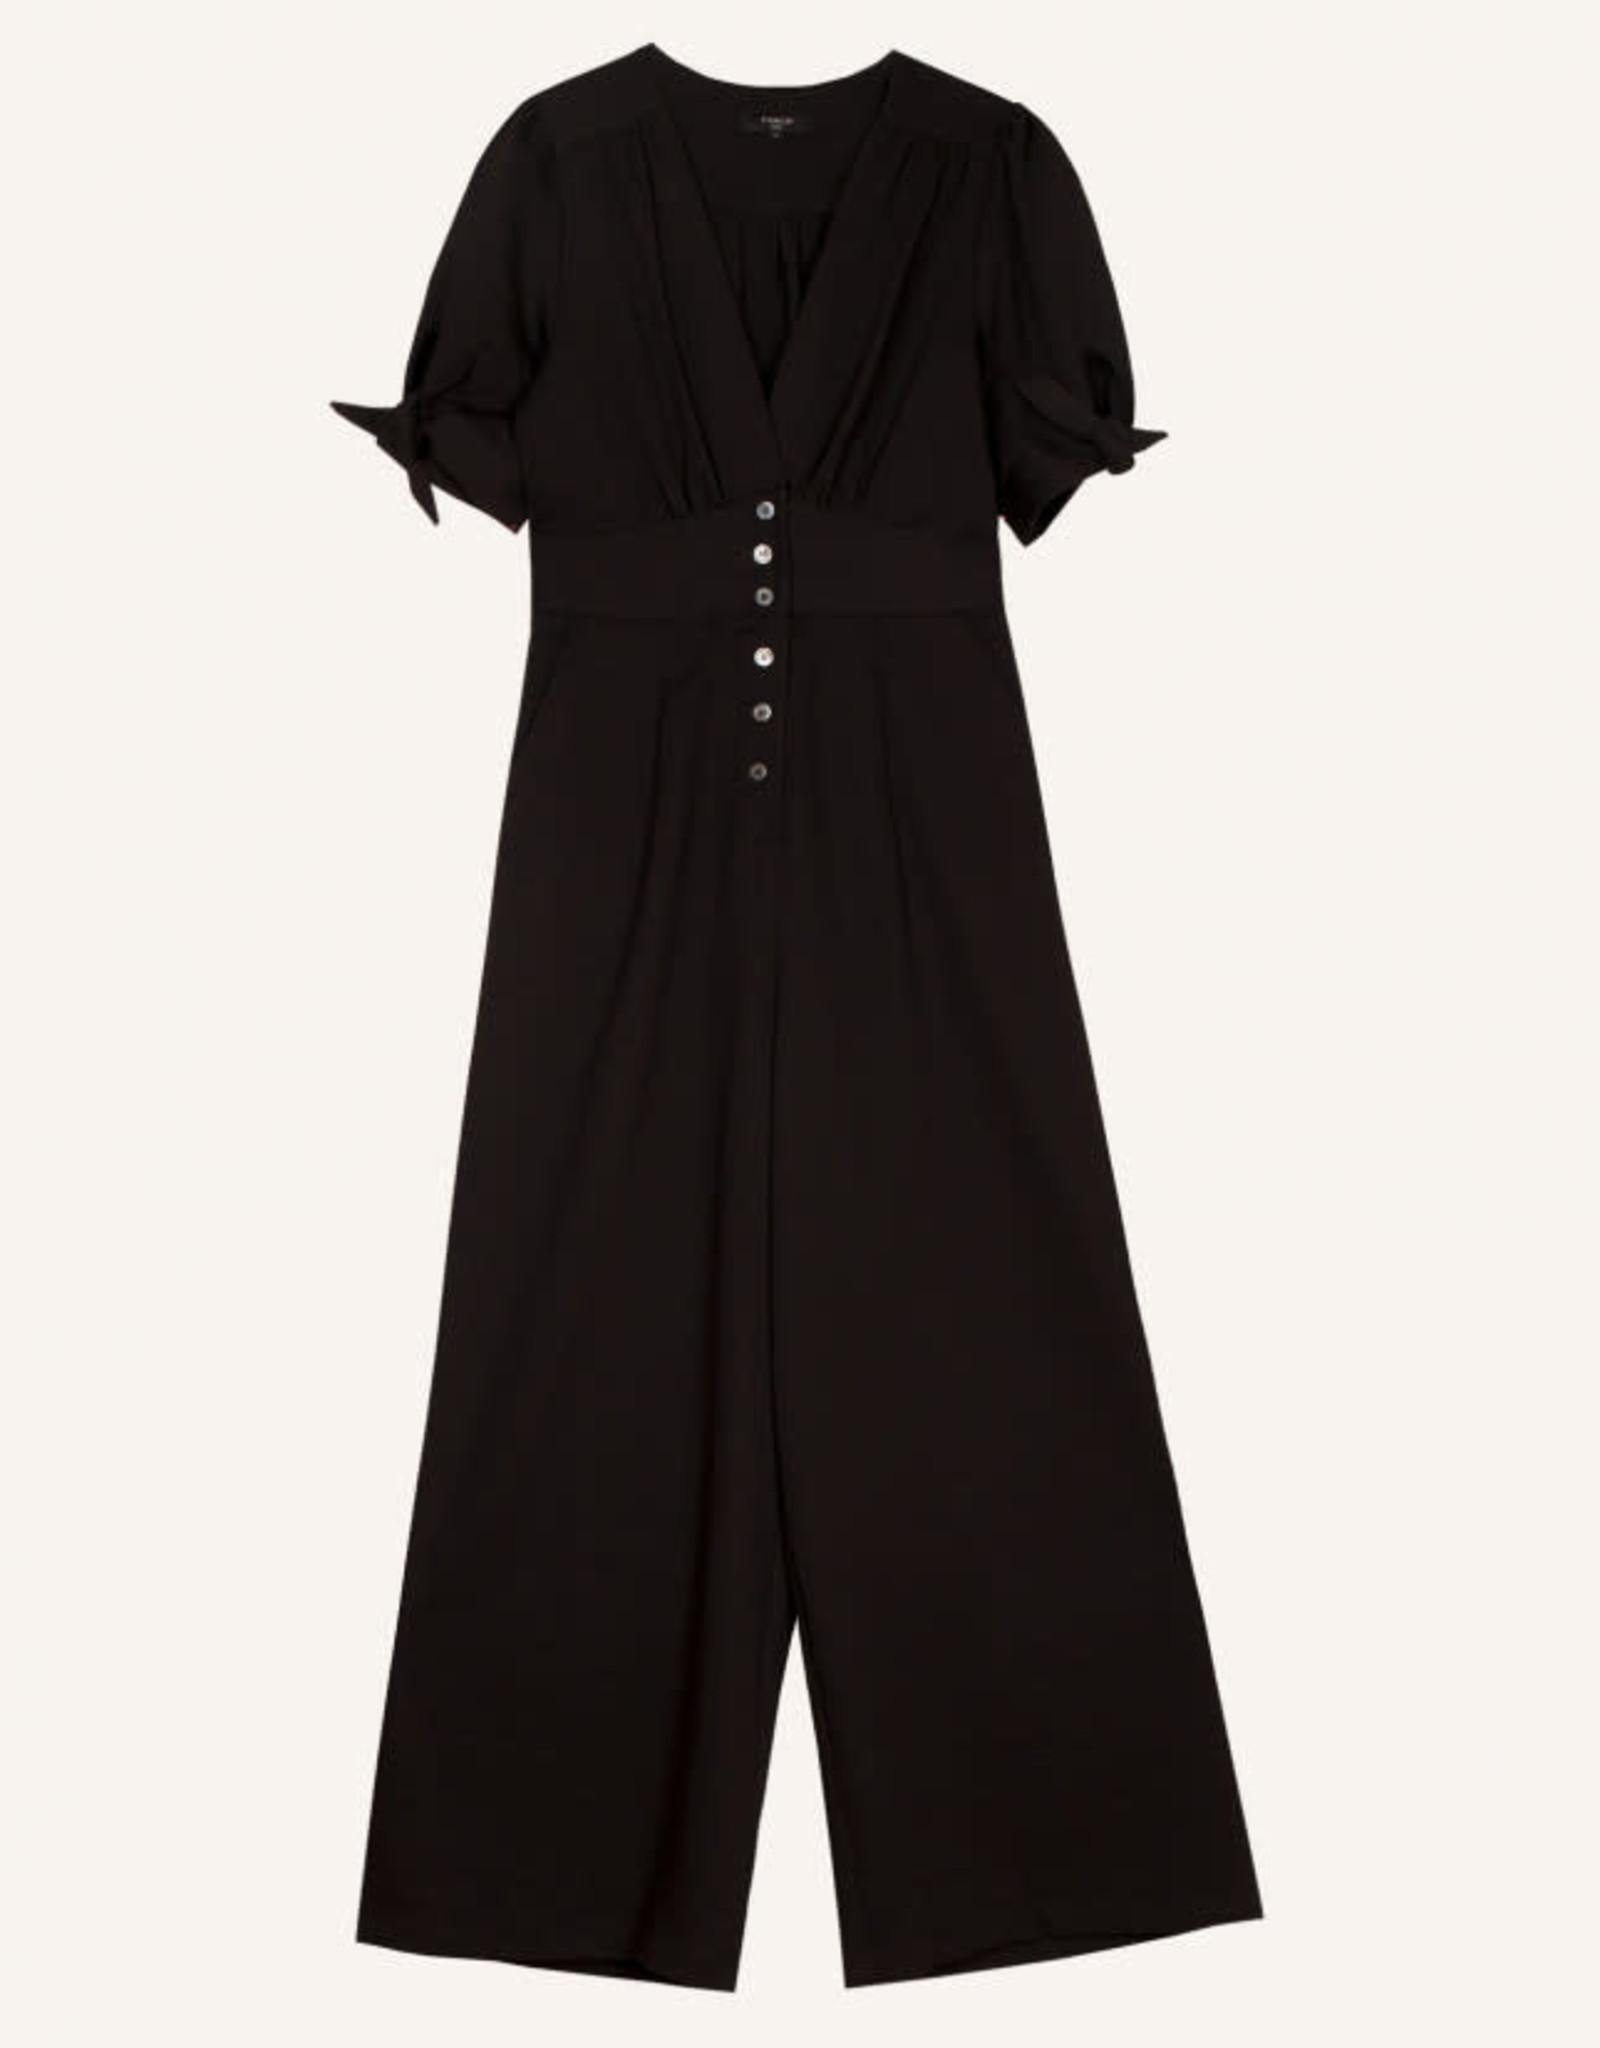 FRNCH FRNCH - Maela jumpsuit